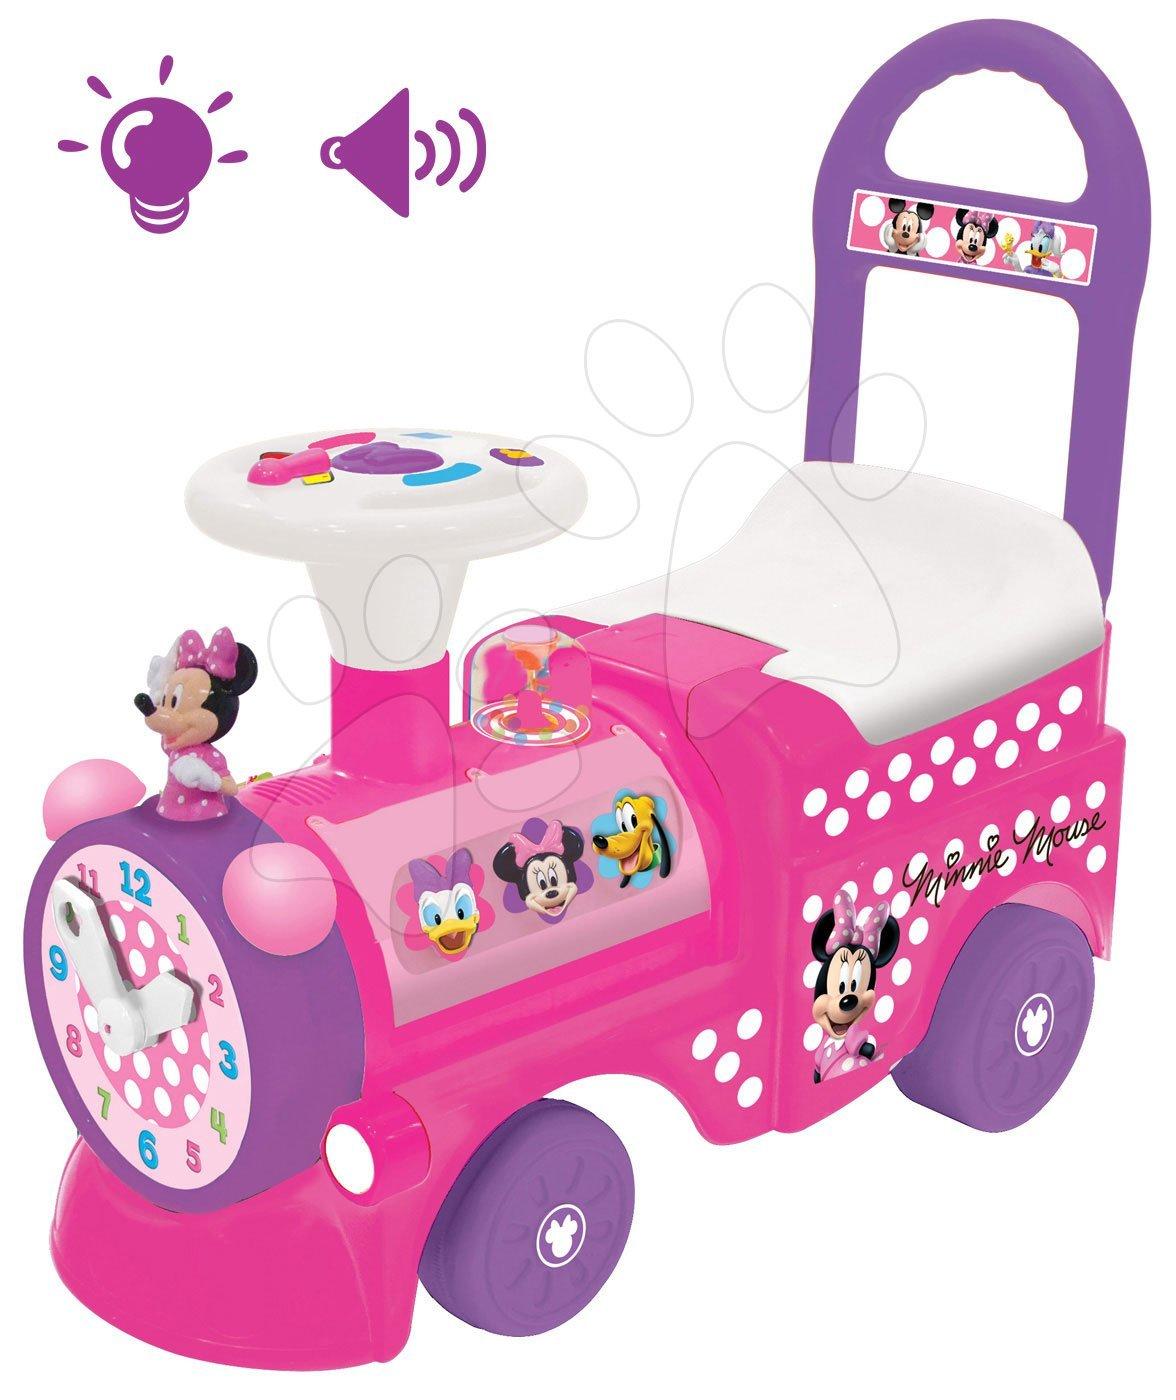 Elektronski poganjalec Disney Kiddieland lokomotiva Minnie z lučko in zvokom rožnat od 12 mes